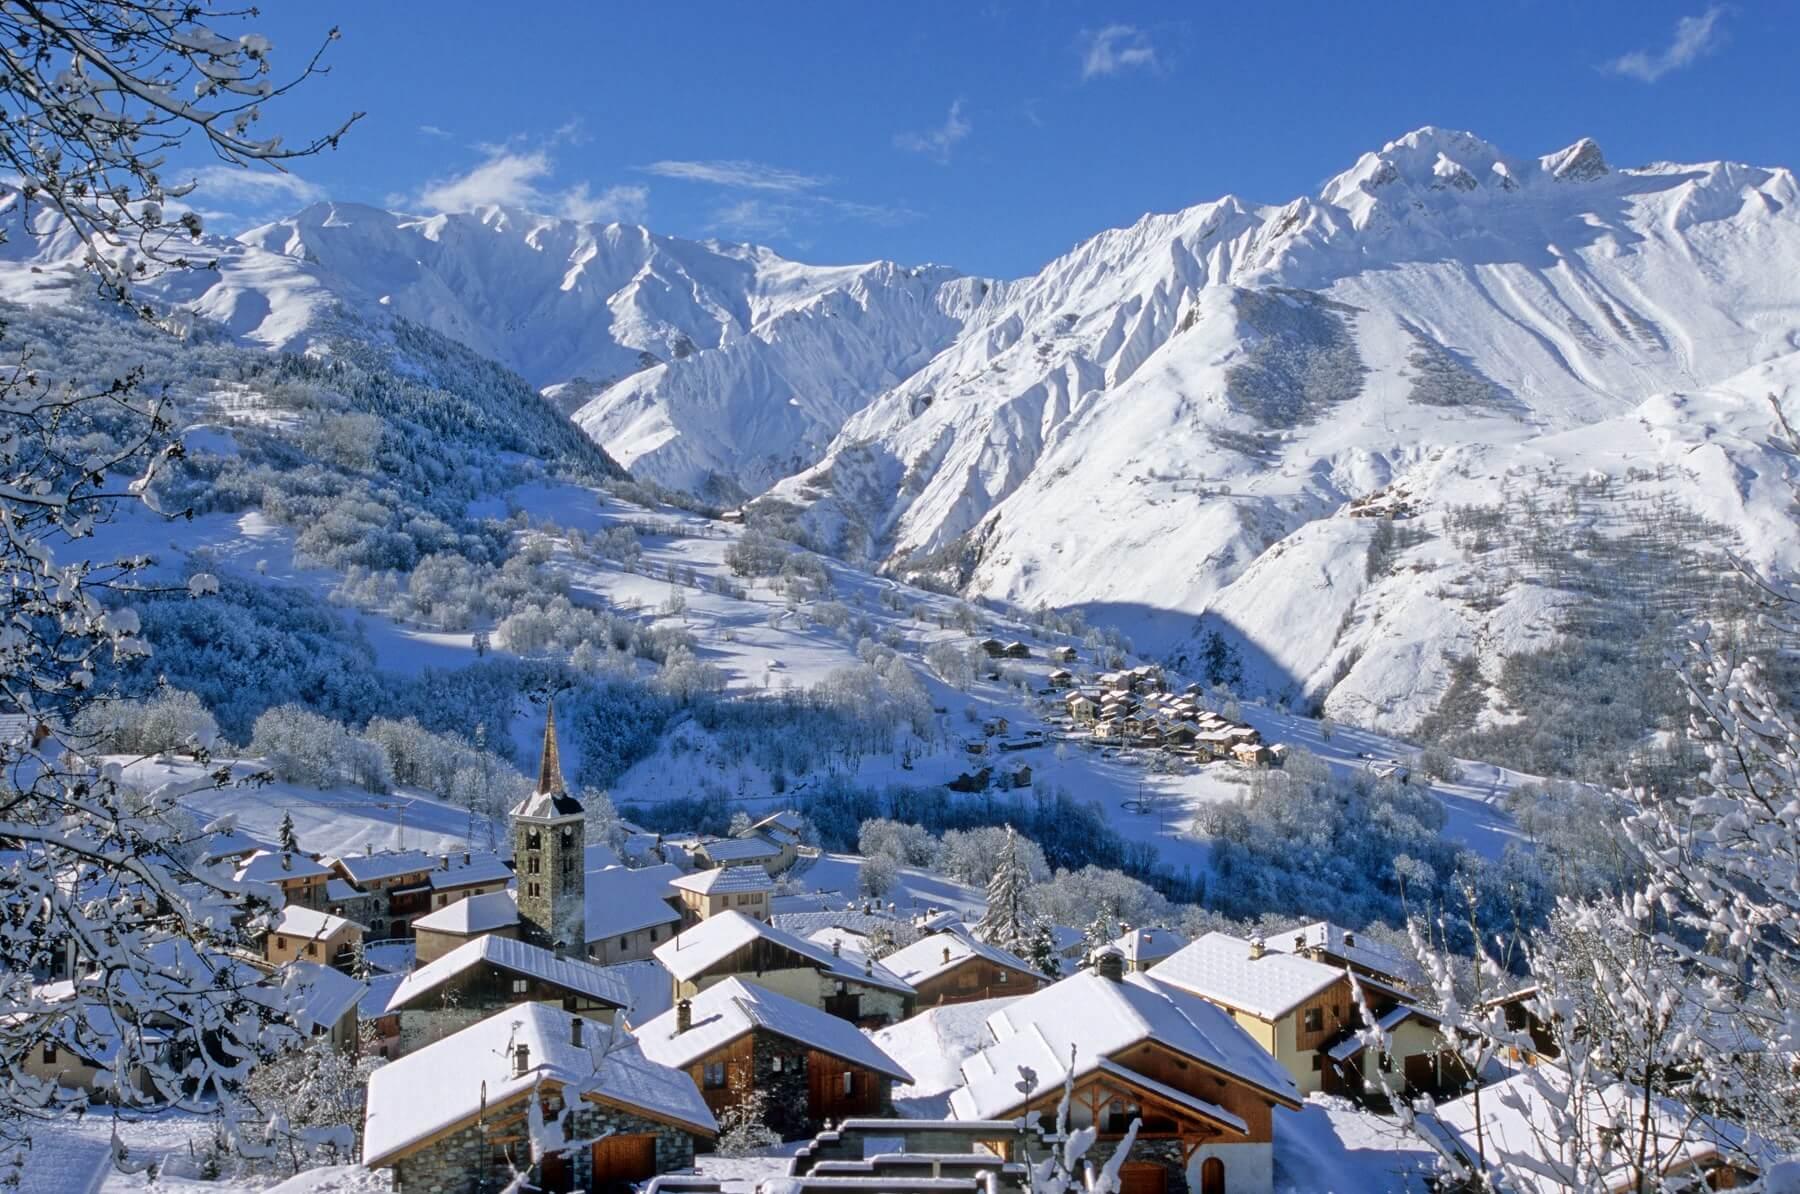 St martin de belleville, Savoie